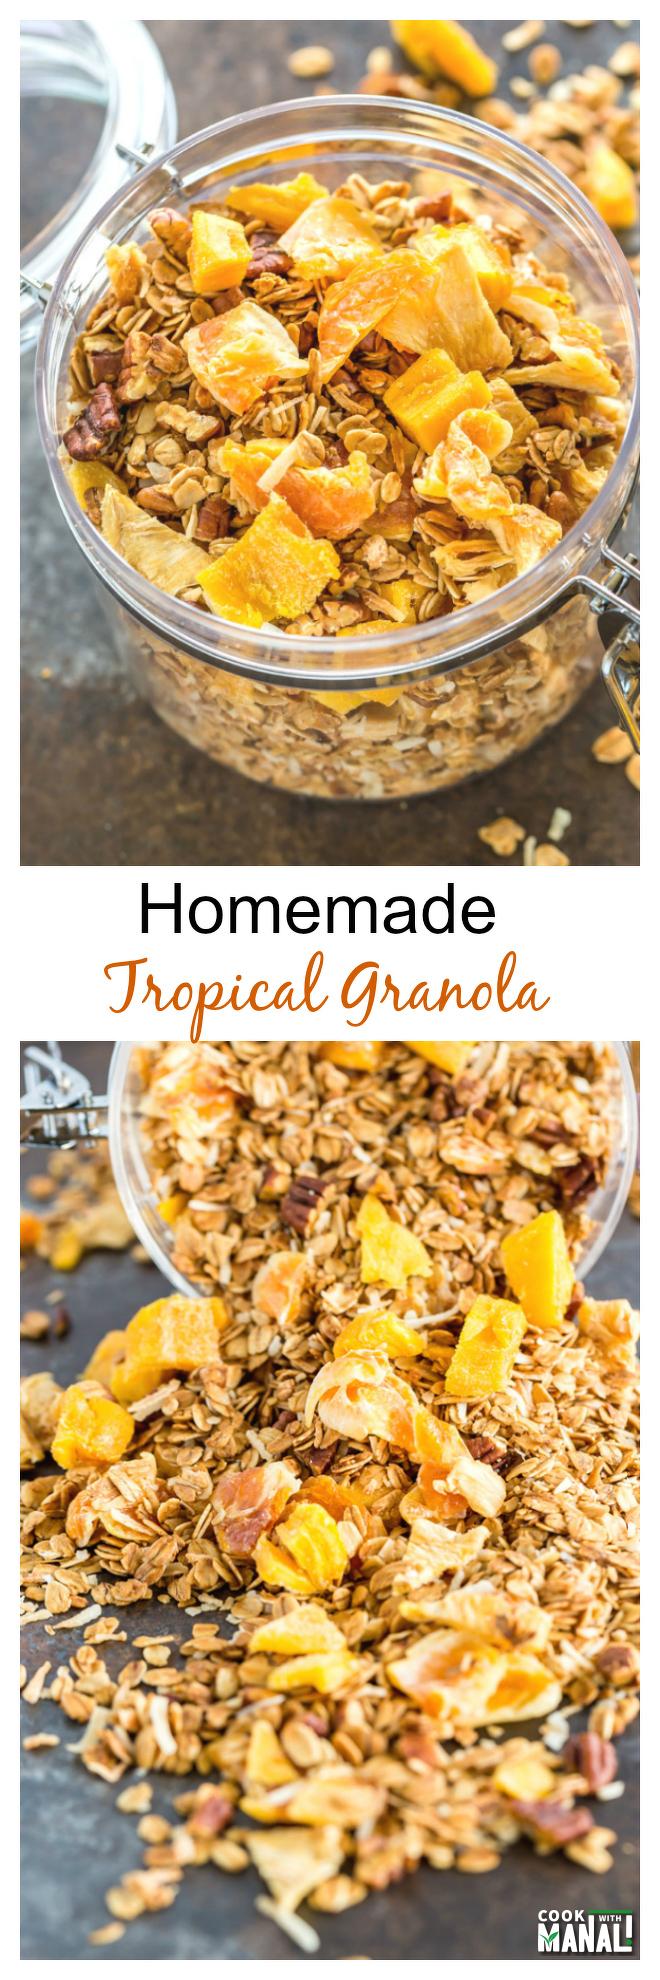 Homemade-Tropical-Granola-Collage